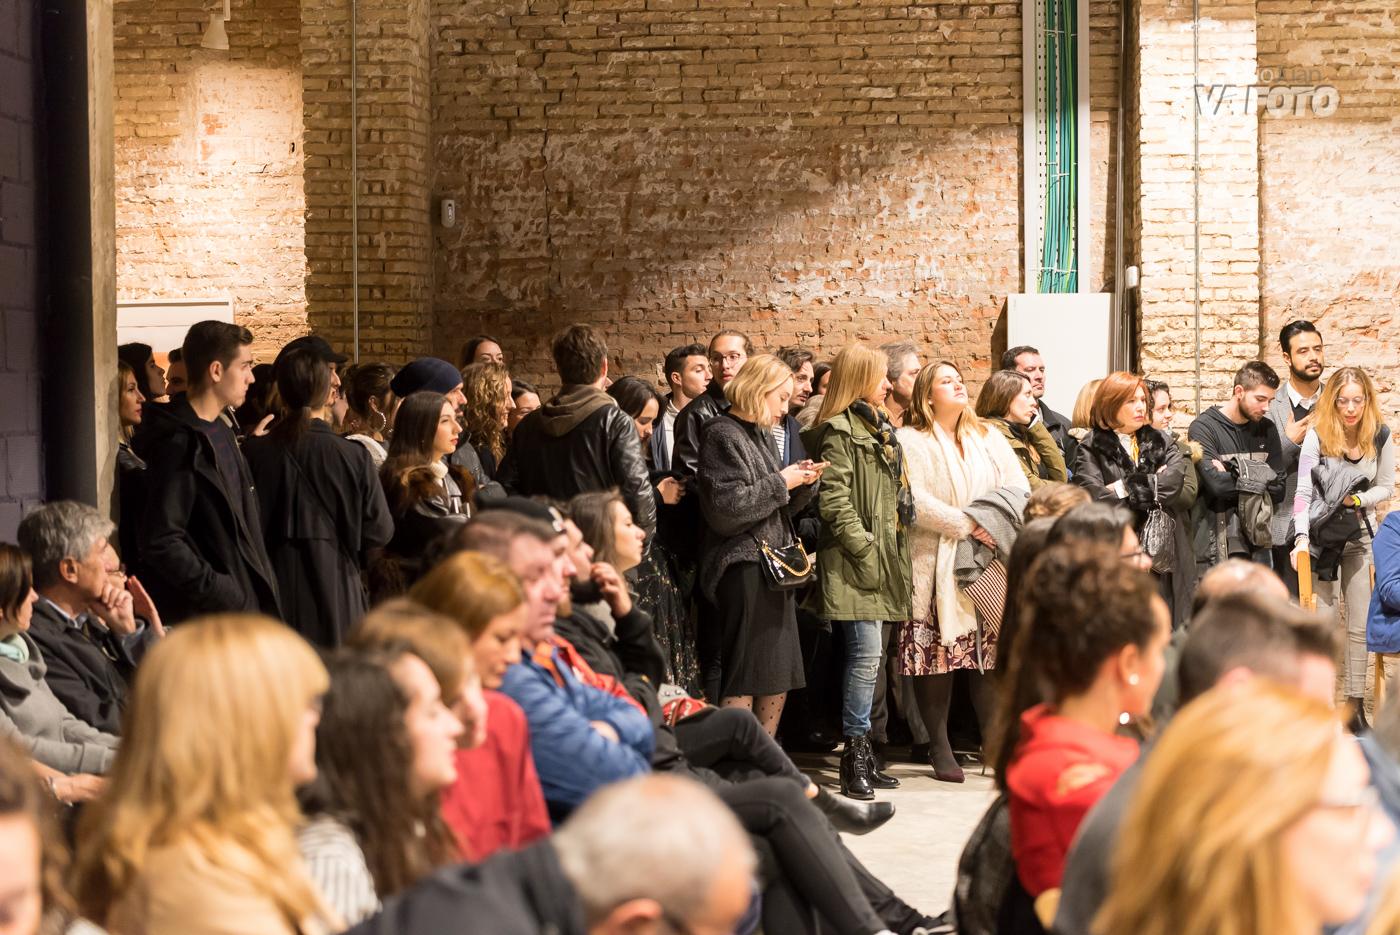 00049 ARTEMODA DSC4148 20181124 - Evento: Arte + Moda Valencia